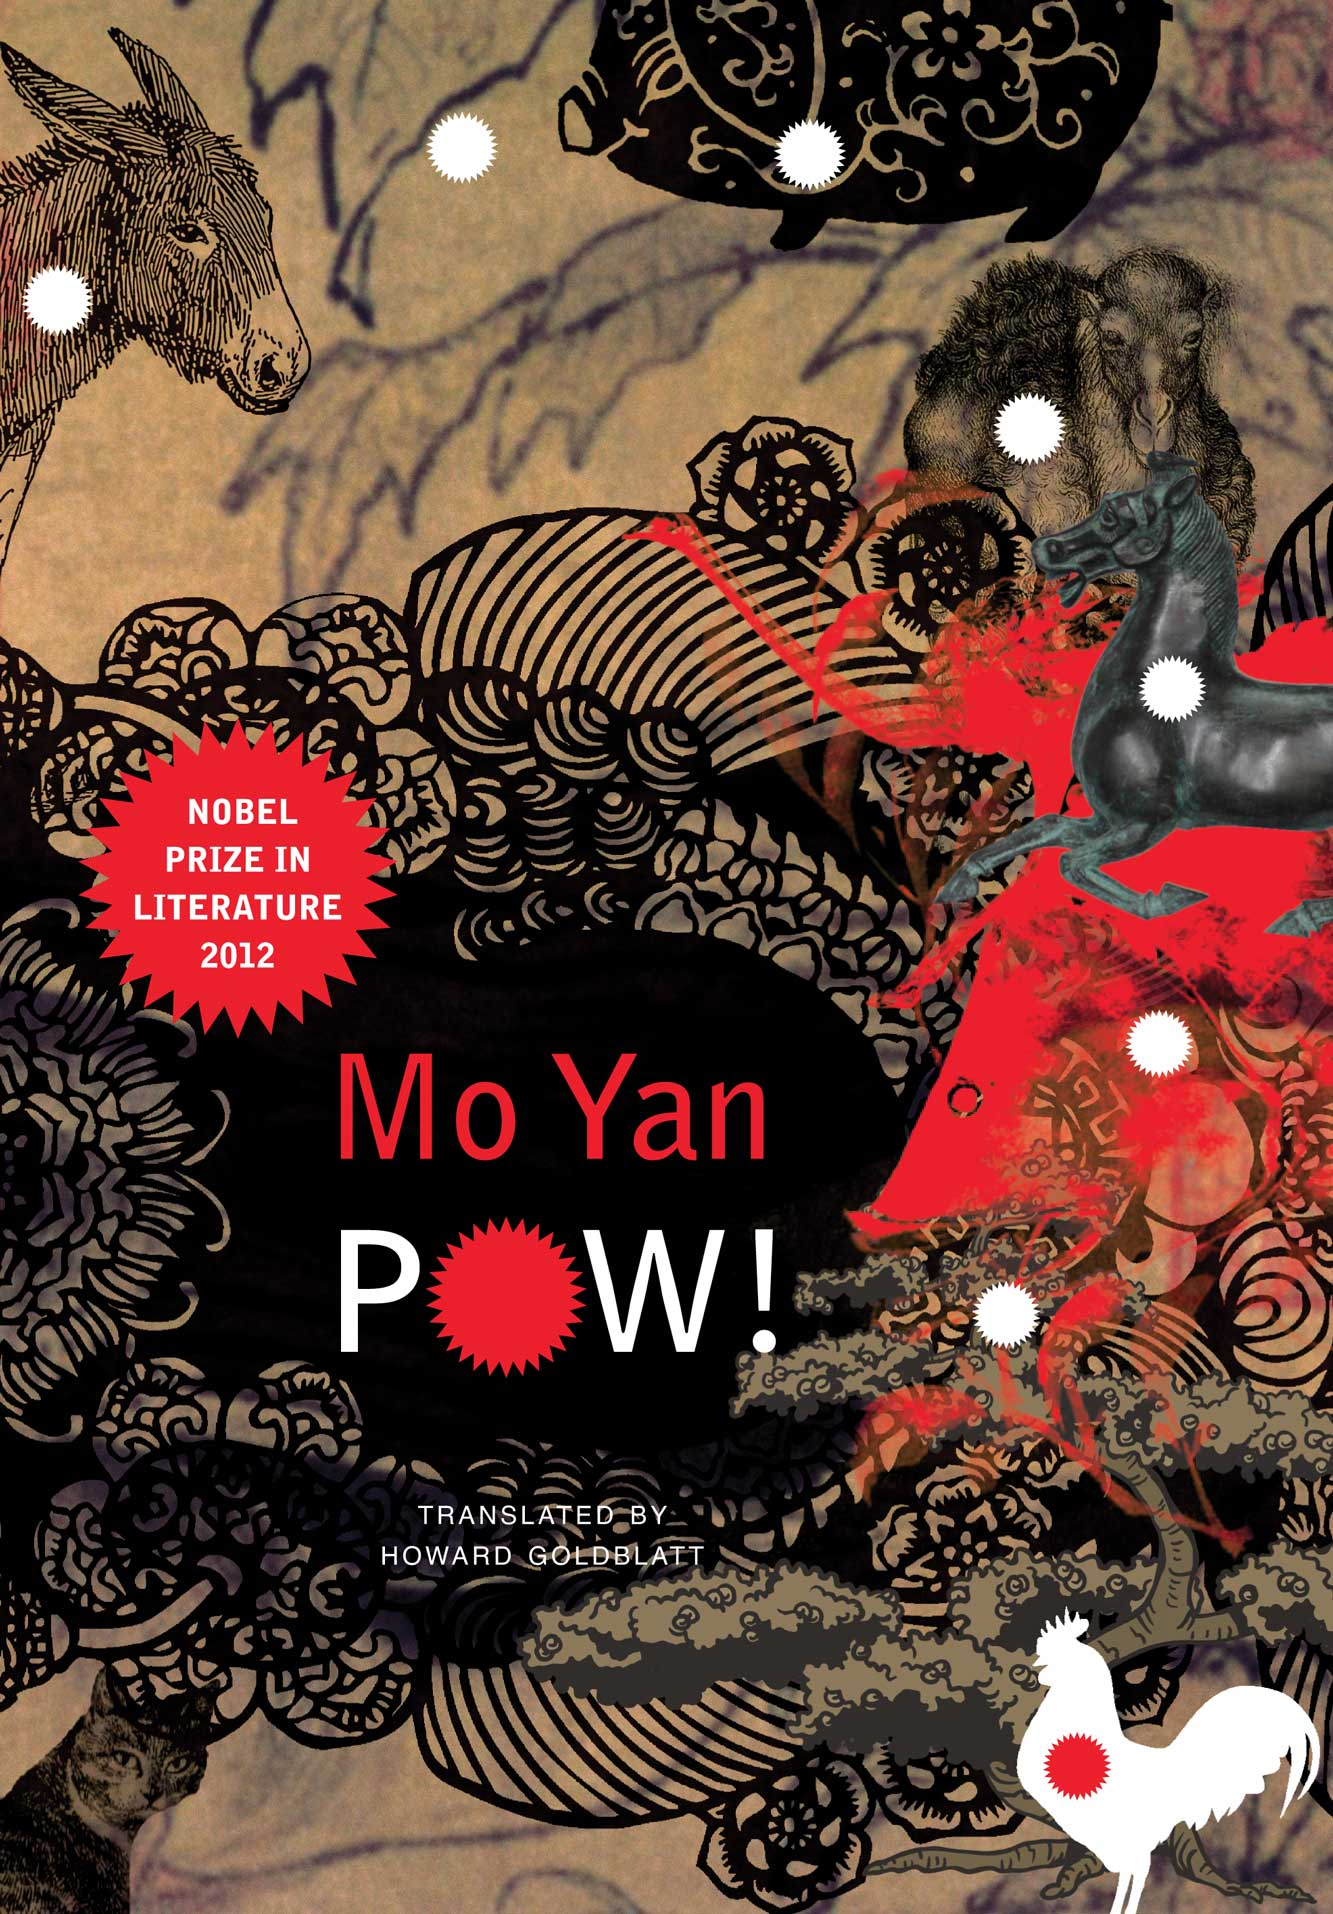 POW! by Mo Yan | Seagull Books